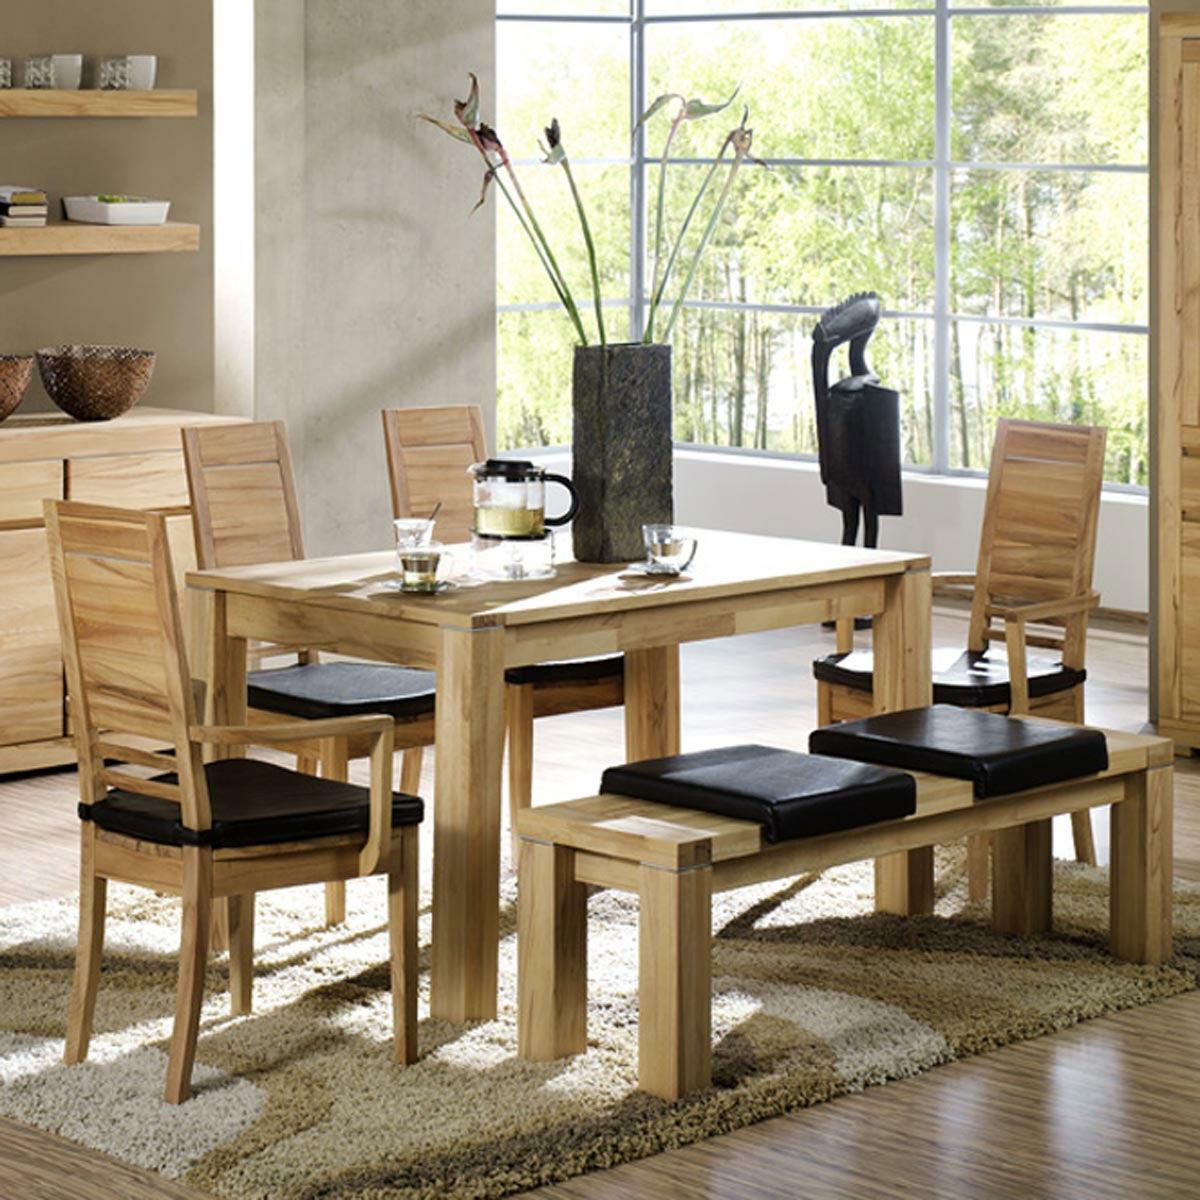 Meja Foyer Minimalis : Harga model meja makan jati minimalis